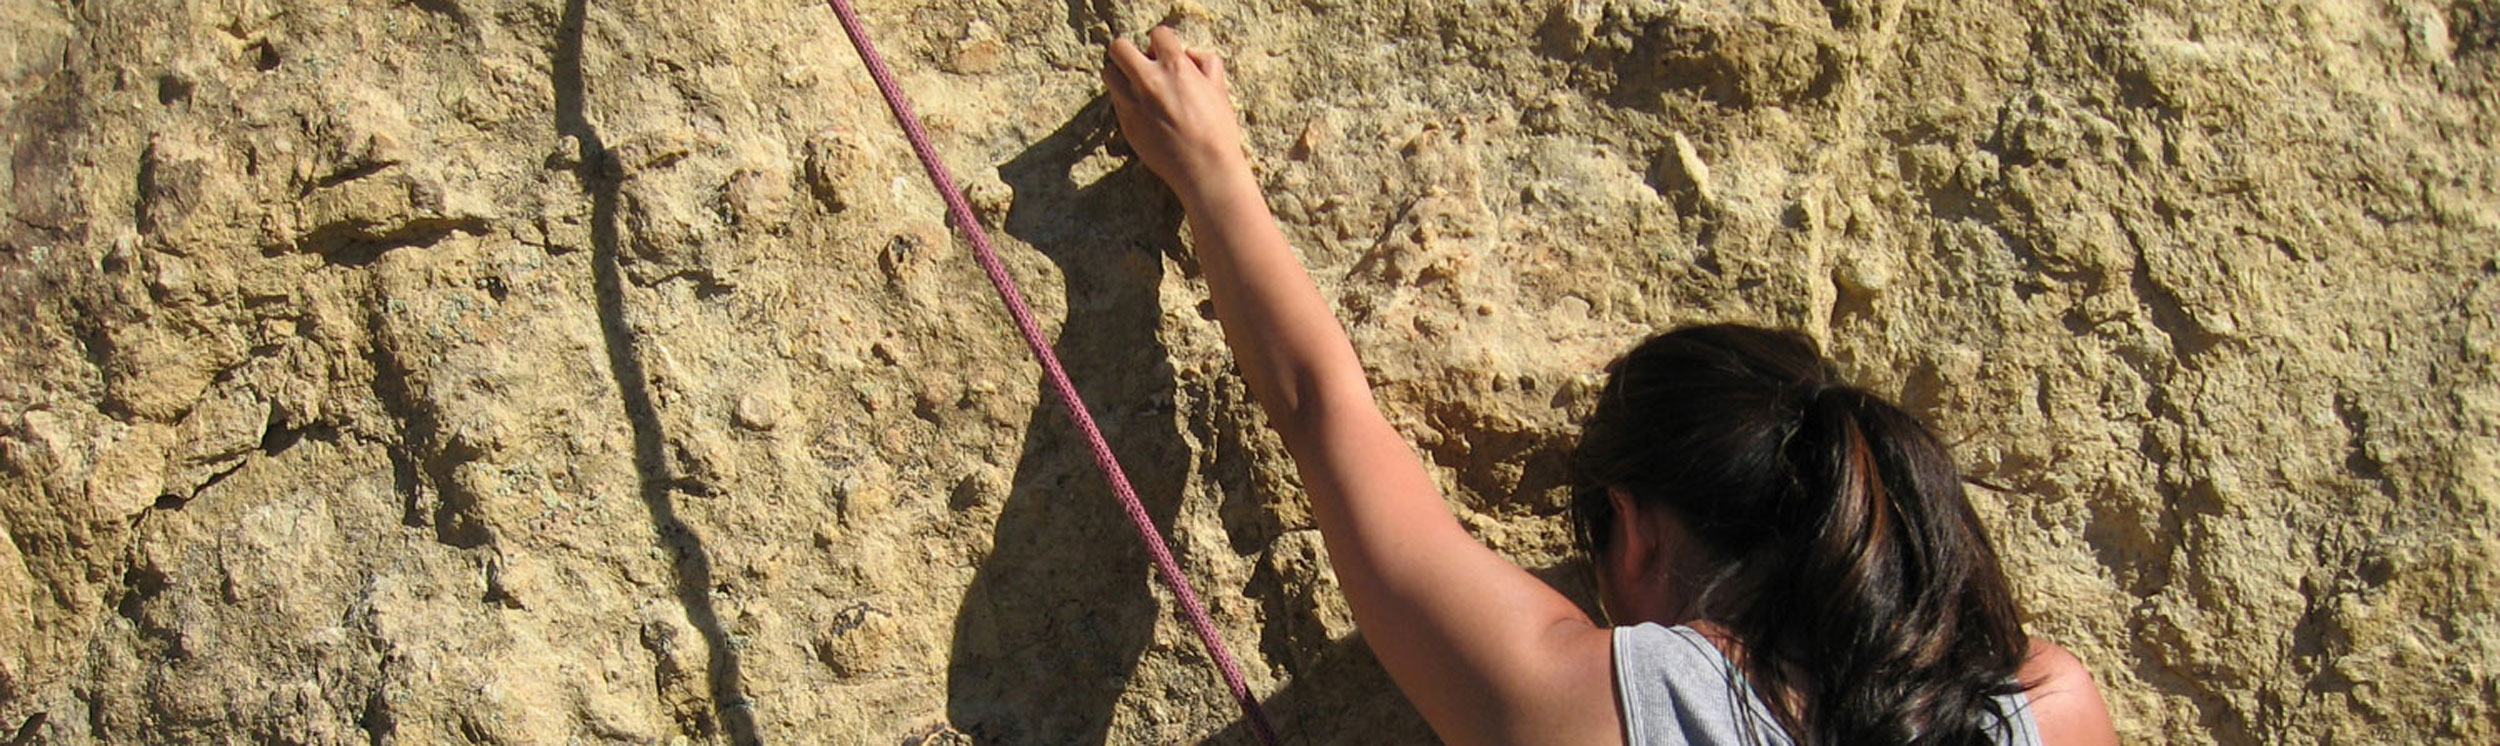 climbing guide - services